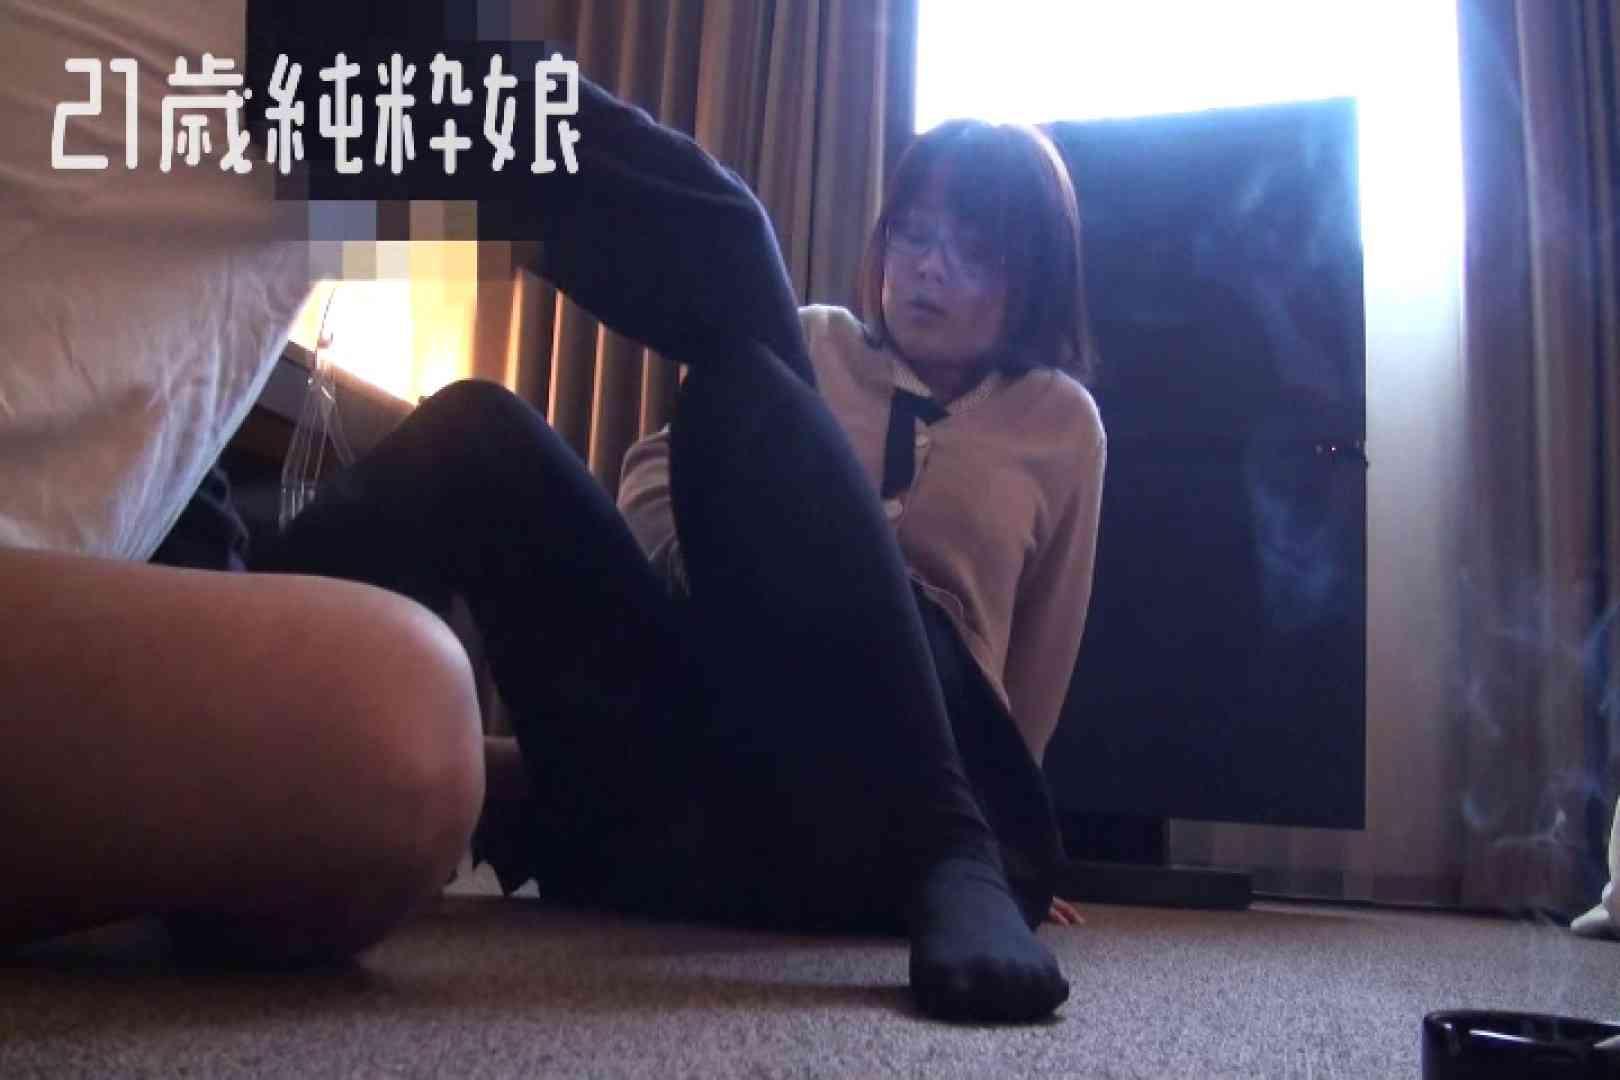 Gカップ21歳純粋嬢第2弾Vol.3 性欲 盗撮動画紹介 71pic 14